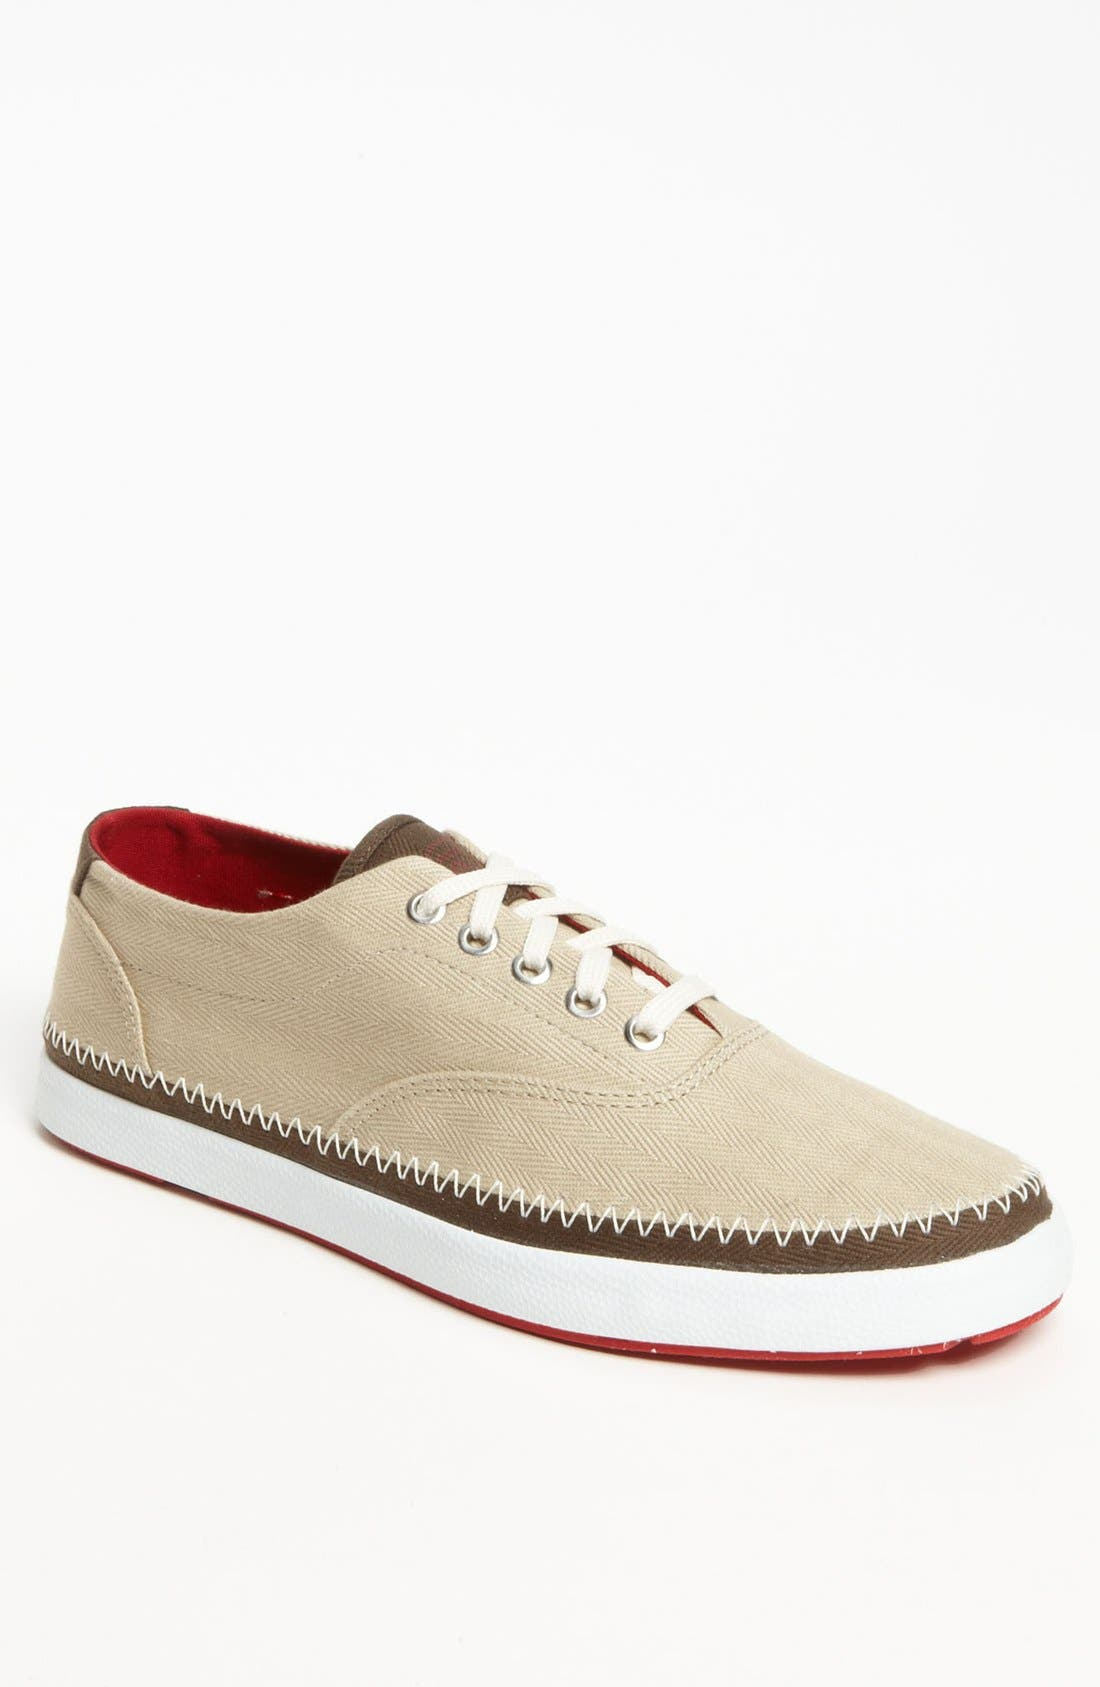 Main Image - Sperry Top-Sider® 'Drifter CVO' Sneaker (Men)